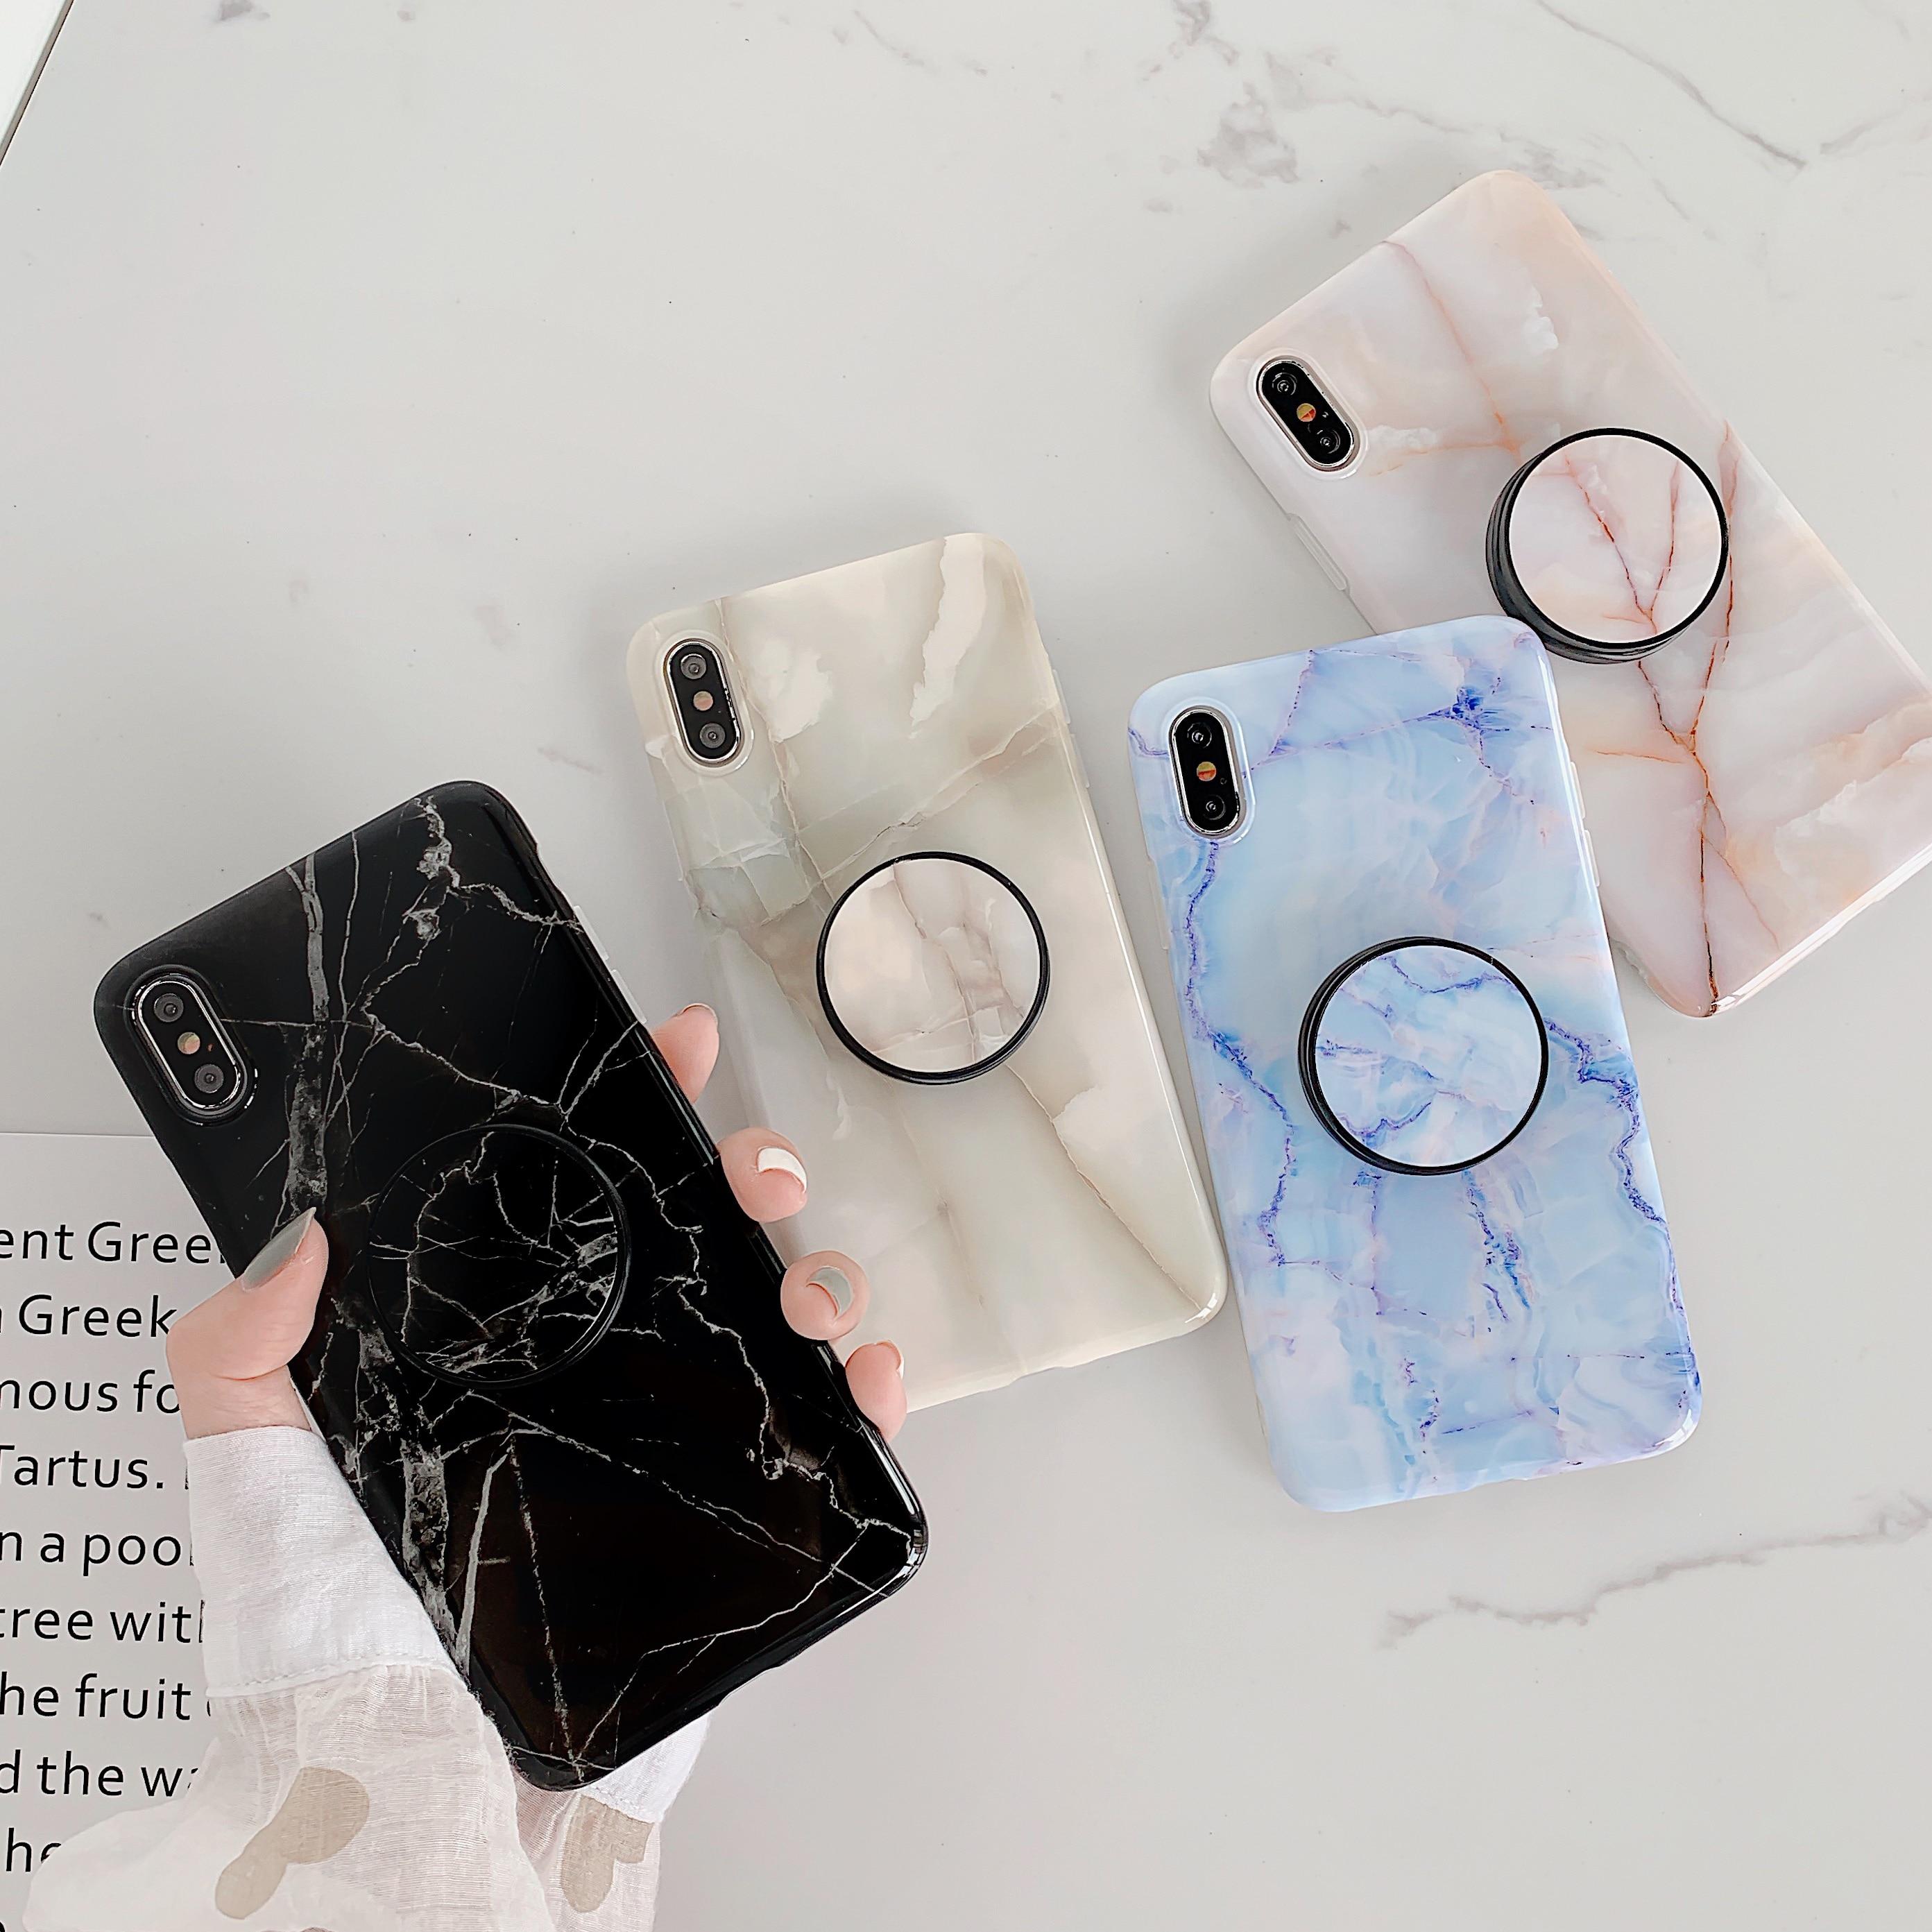 Negro brillante azul mármol soporte anillo soporte titular del teléfono para iPhone 11 Pro XS Max XR X 10 6s 6 7 8 Plus cubierta Fundas